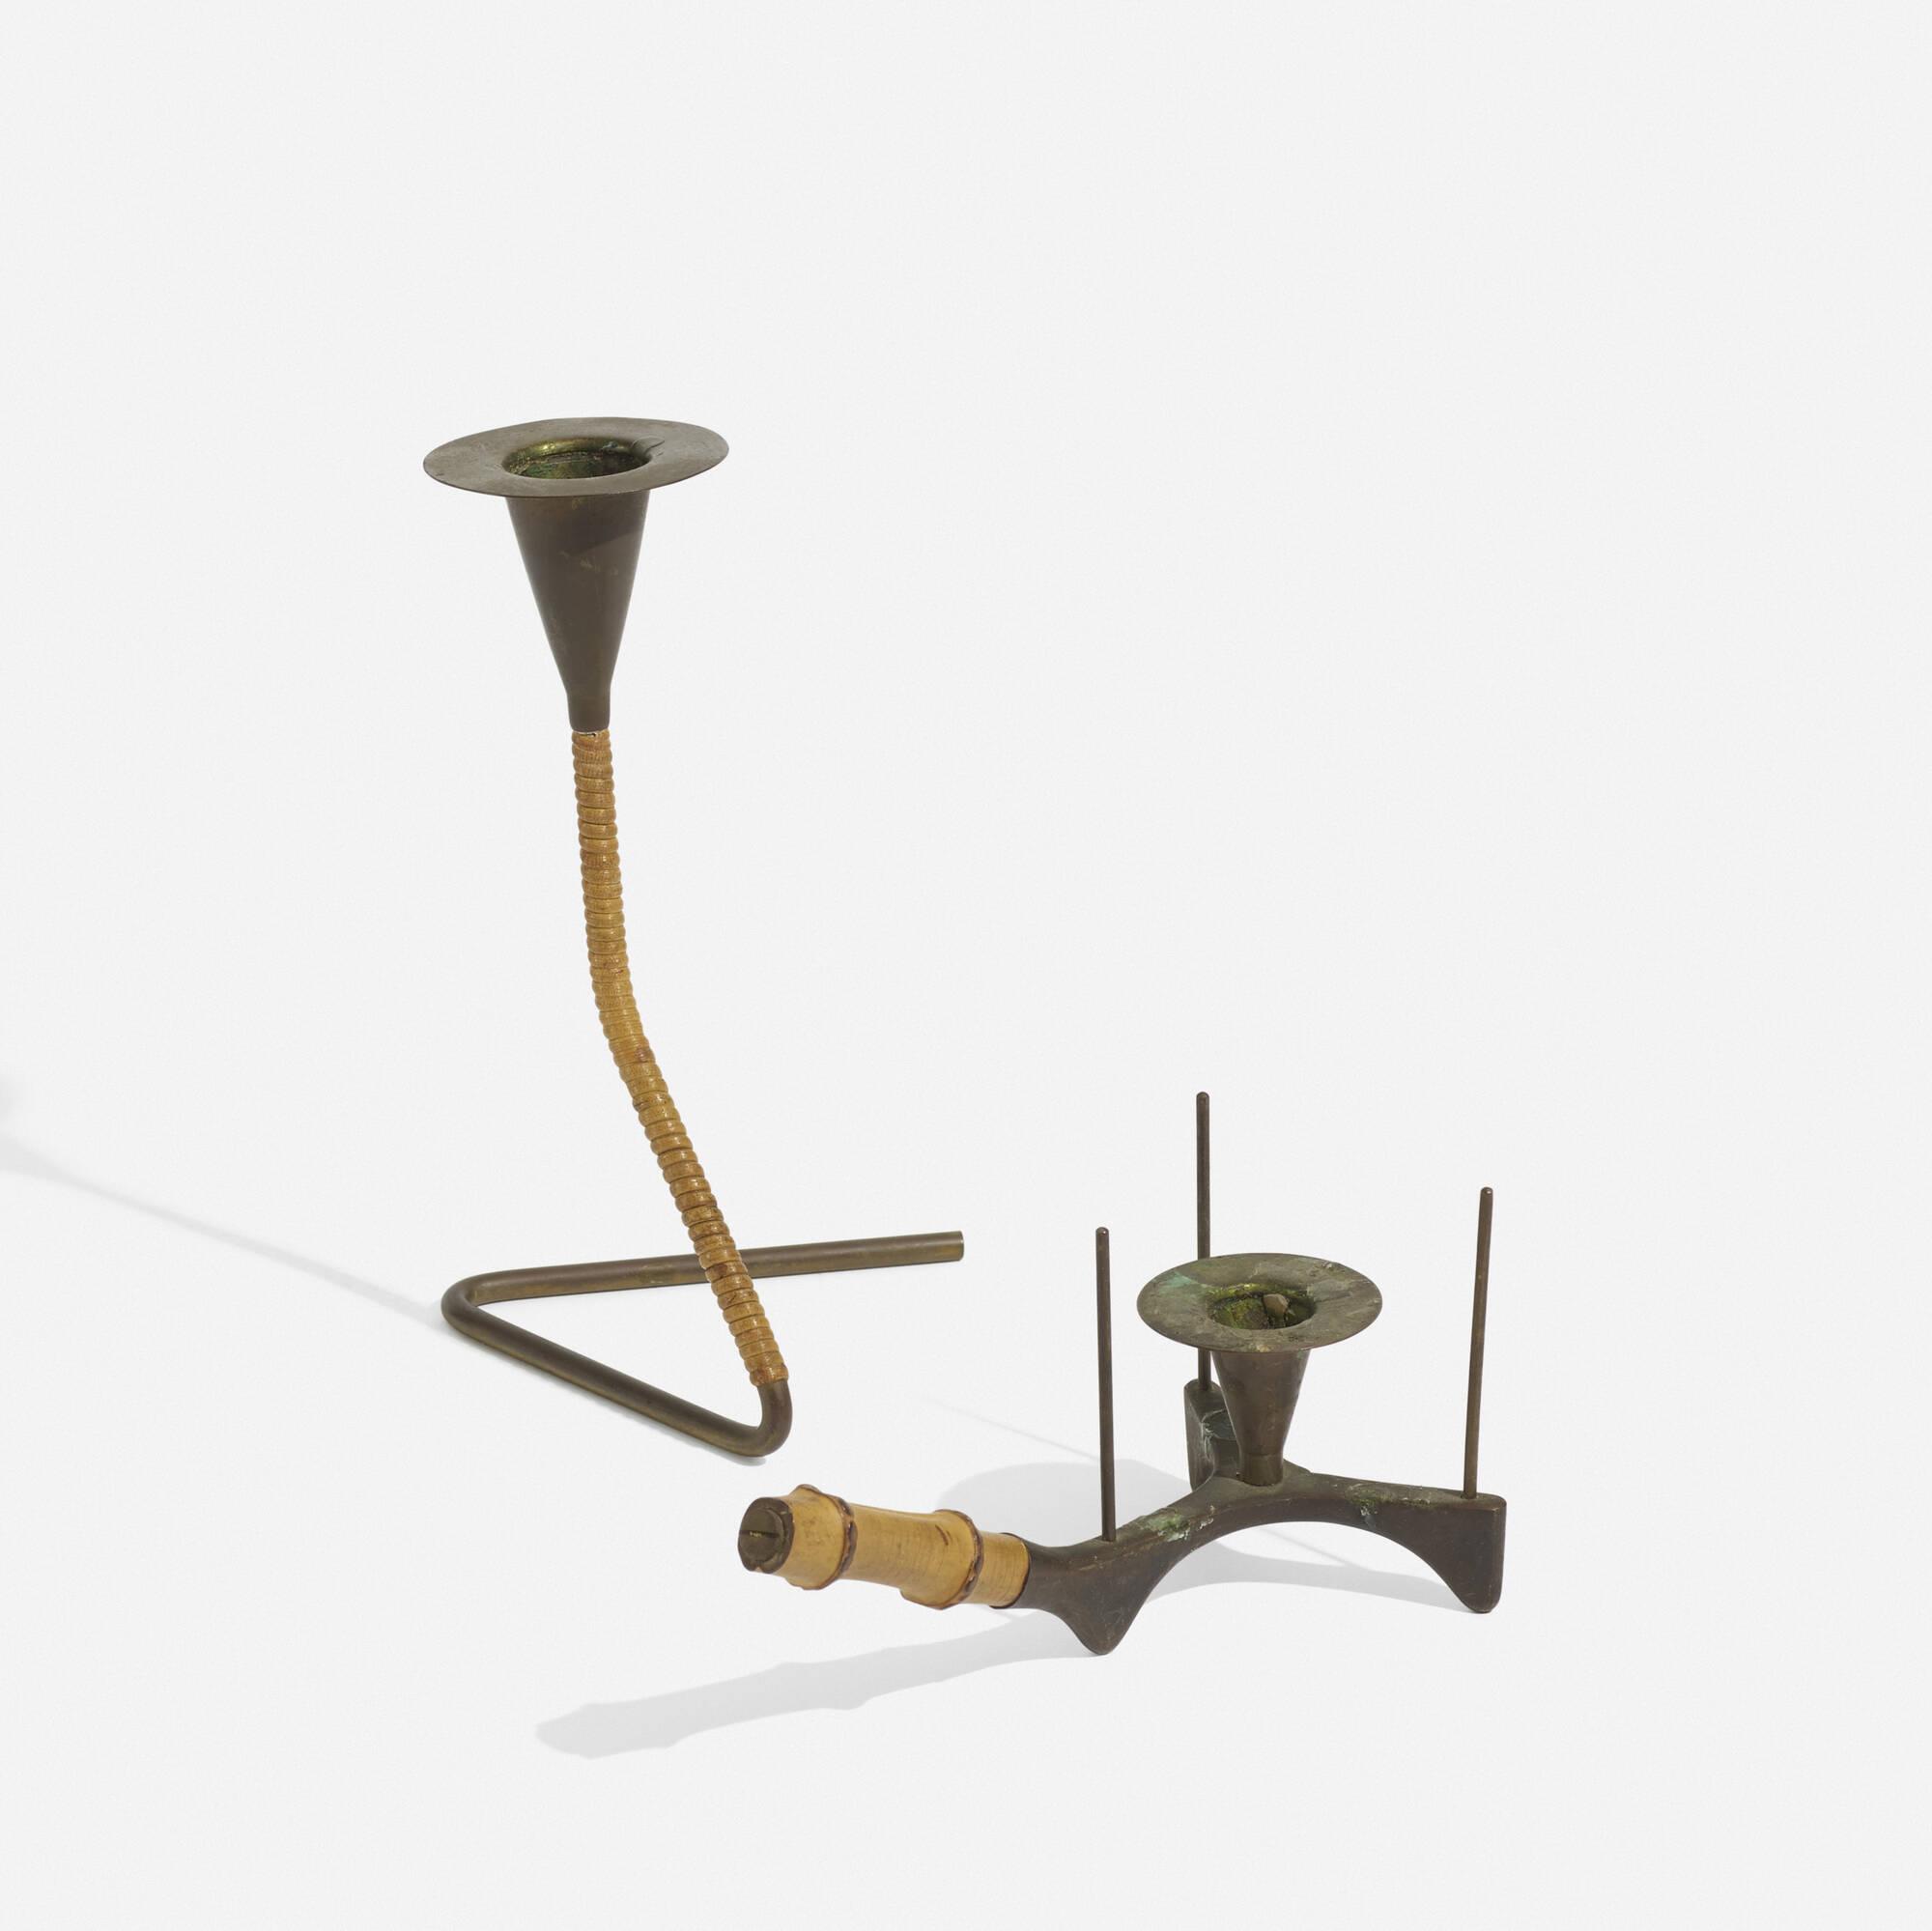 256: Carl Auböck II / candlesticks, pair (1 of 2)